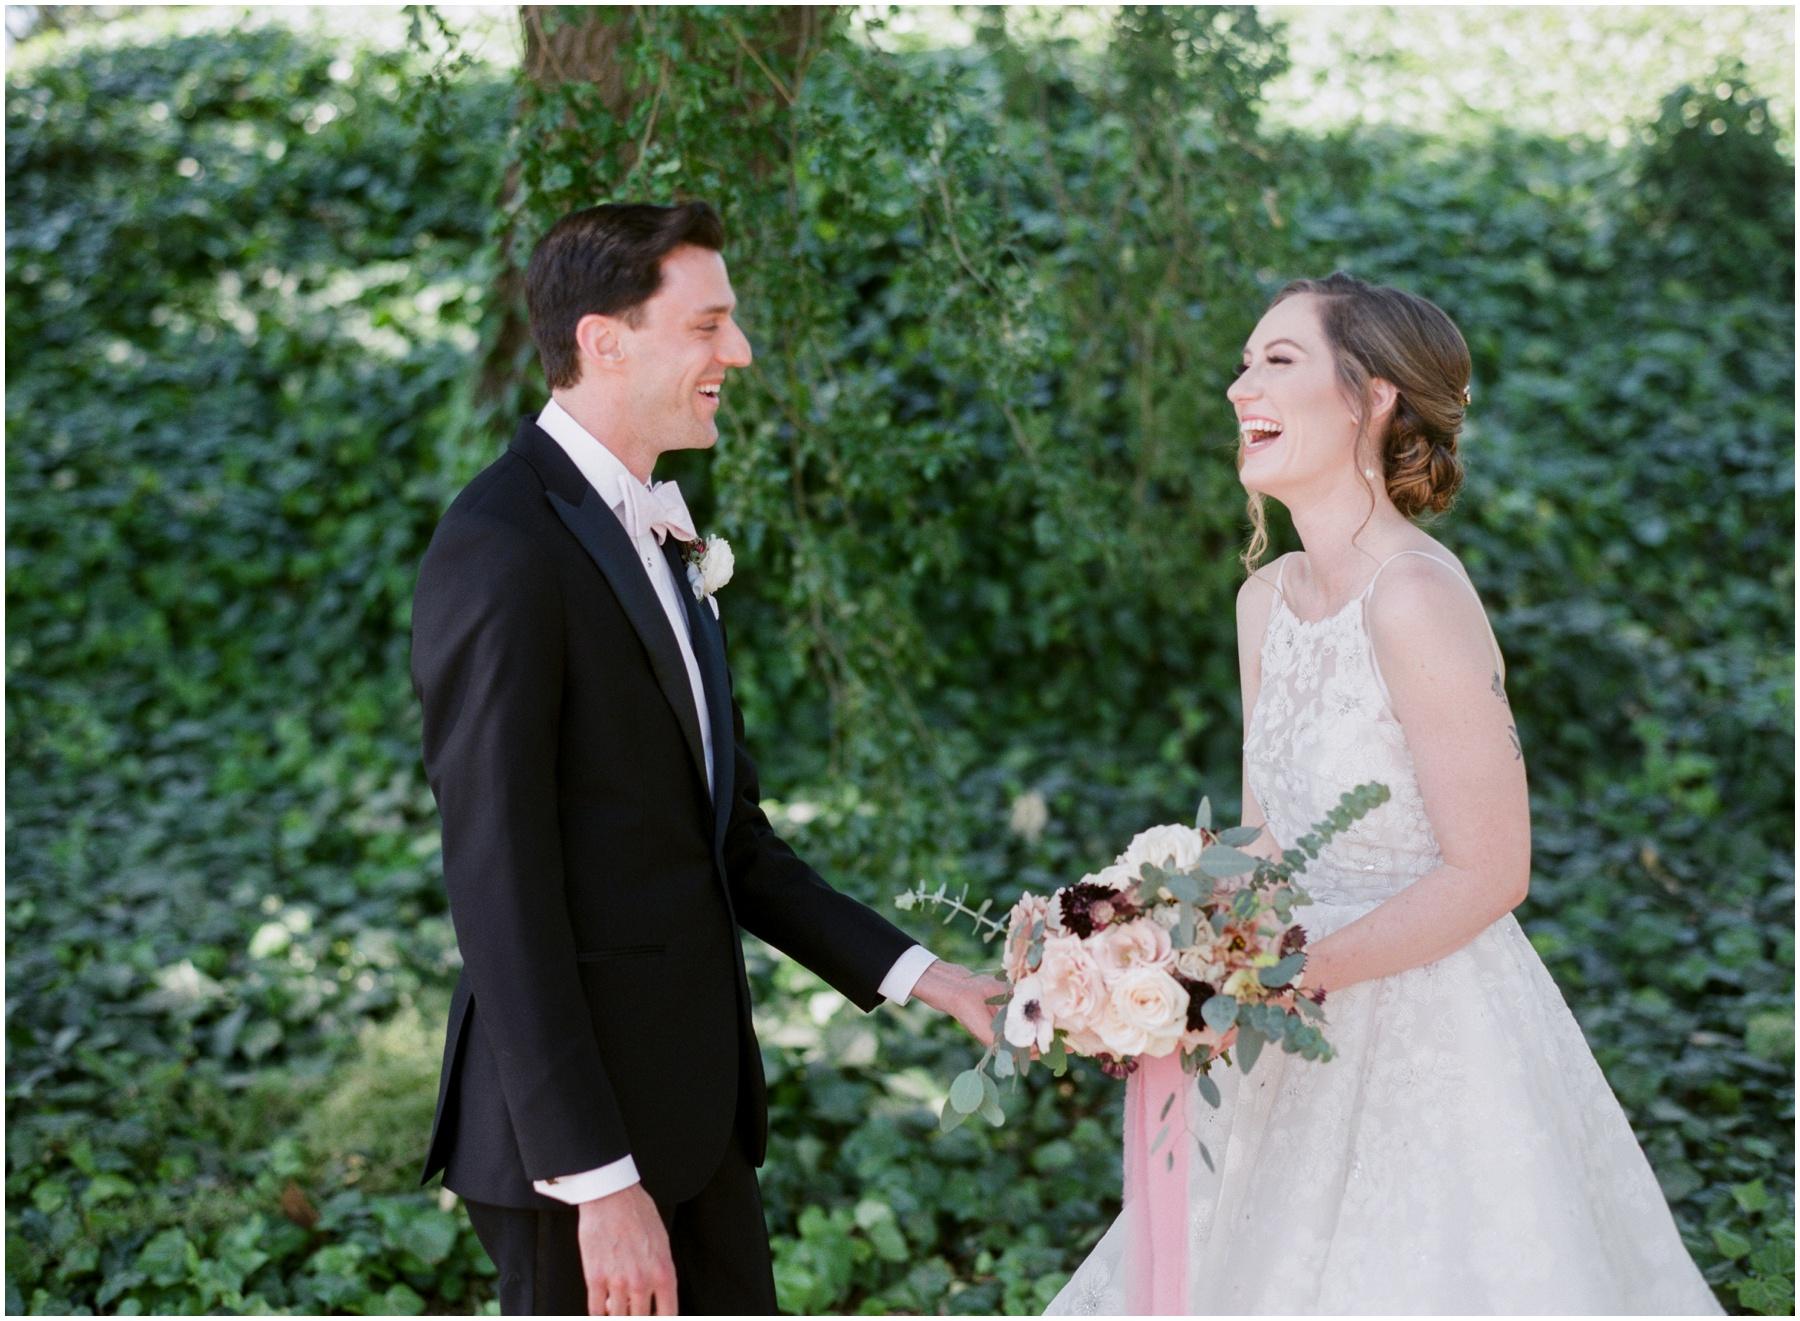 Scribner-bend-vineyards-wedding-sacramento-california-Kristine-Herman-Photography-74.jpg